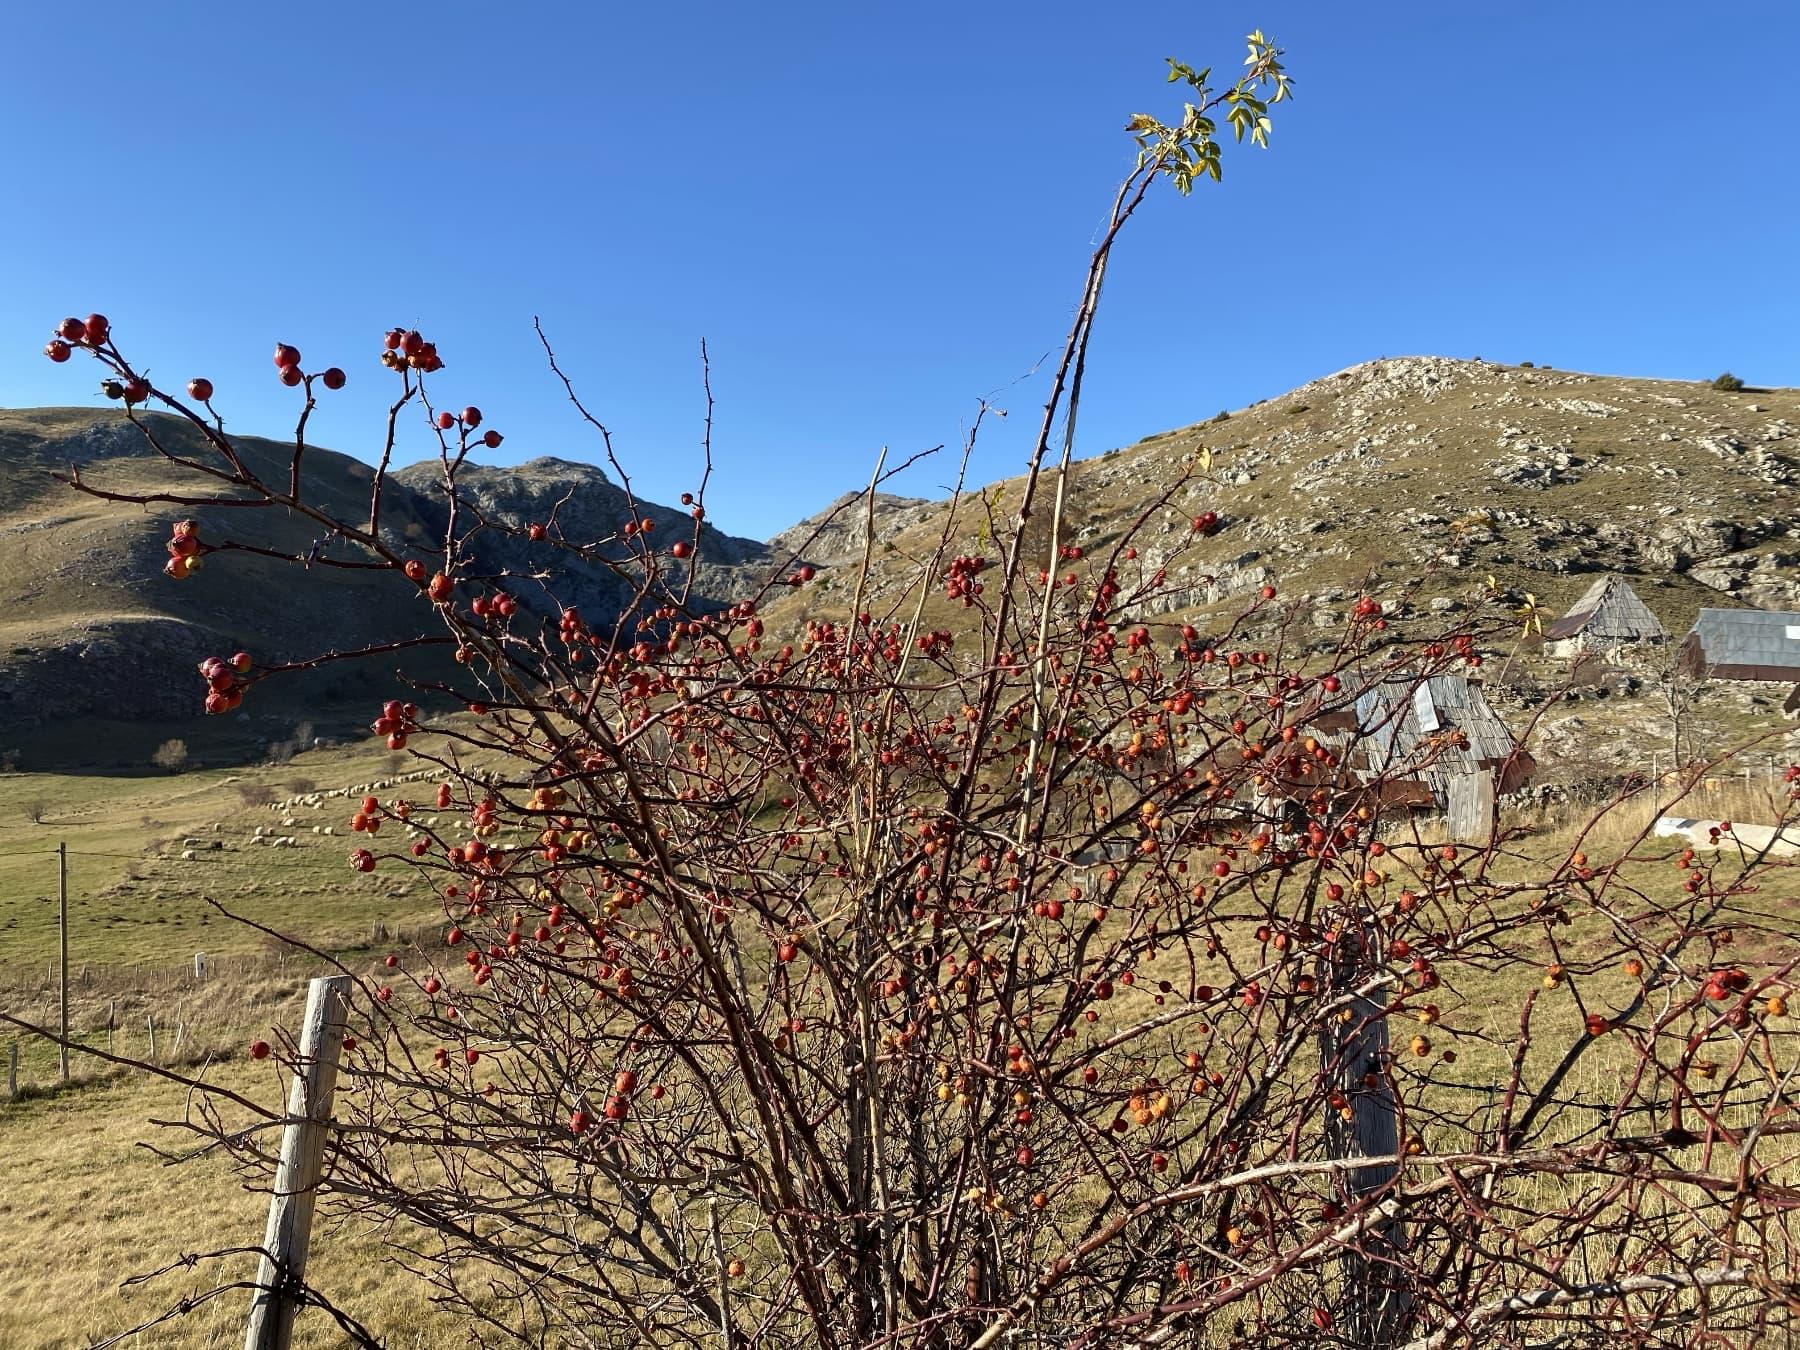 Mountain Village Umoljani - In Search of the Stone Dragon 4